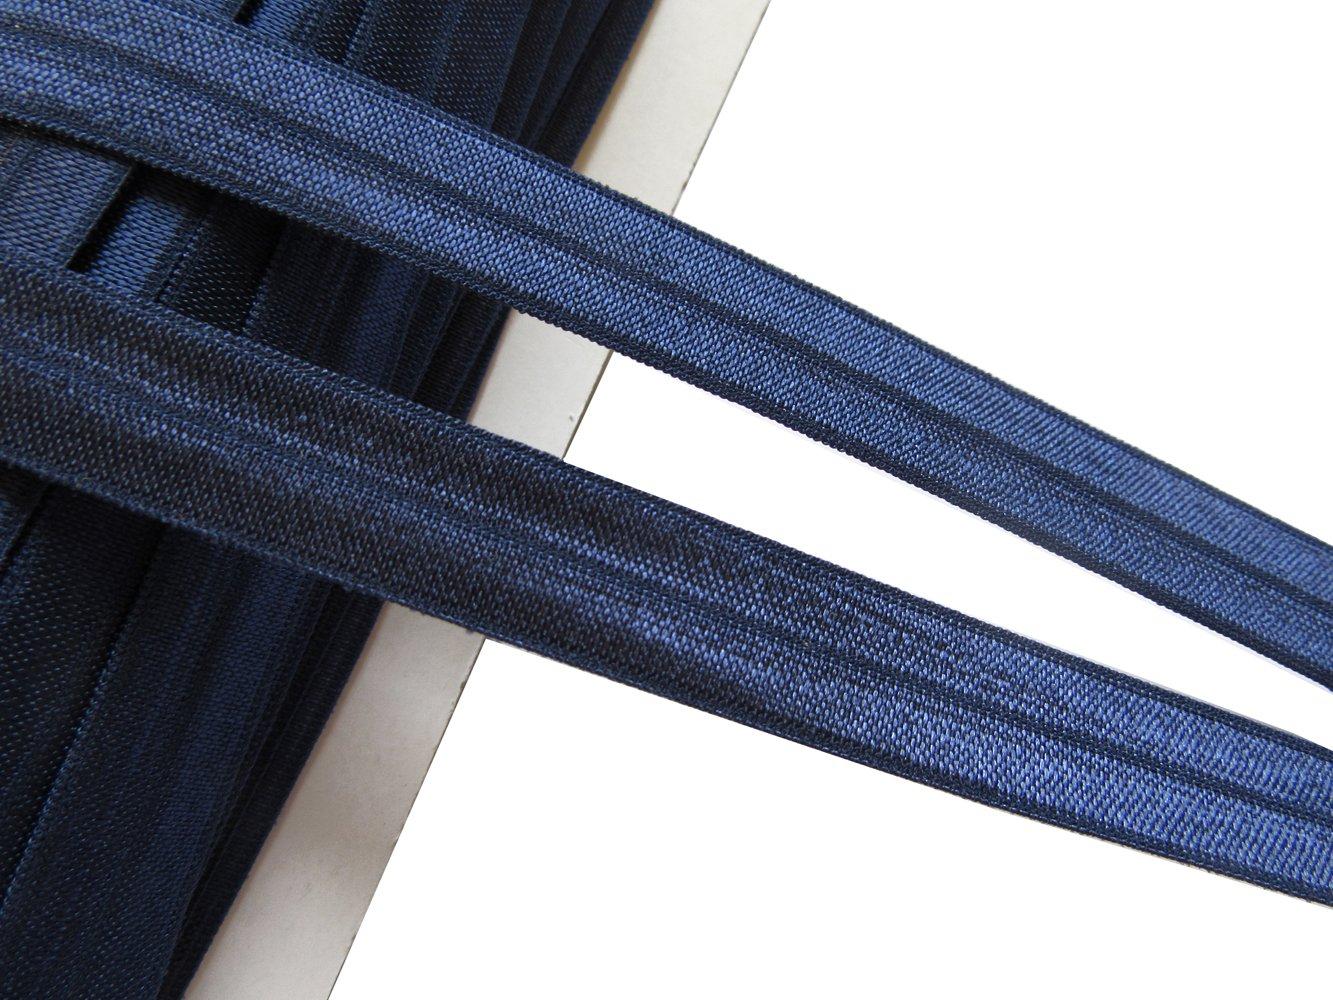 YYCRAFT 40 Yards Bulk Elastics,Solid and Prints Fold Over Elastics,Stretch Lace Elastic for DIY Headband Kit//Hair Ties Craft